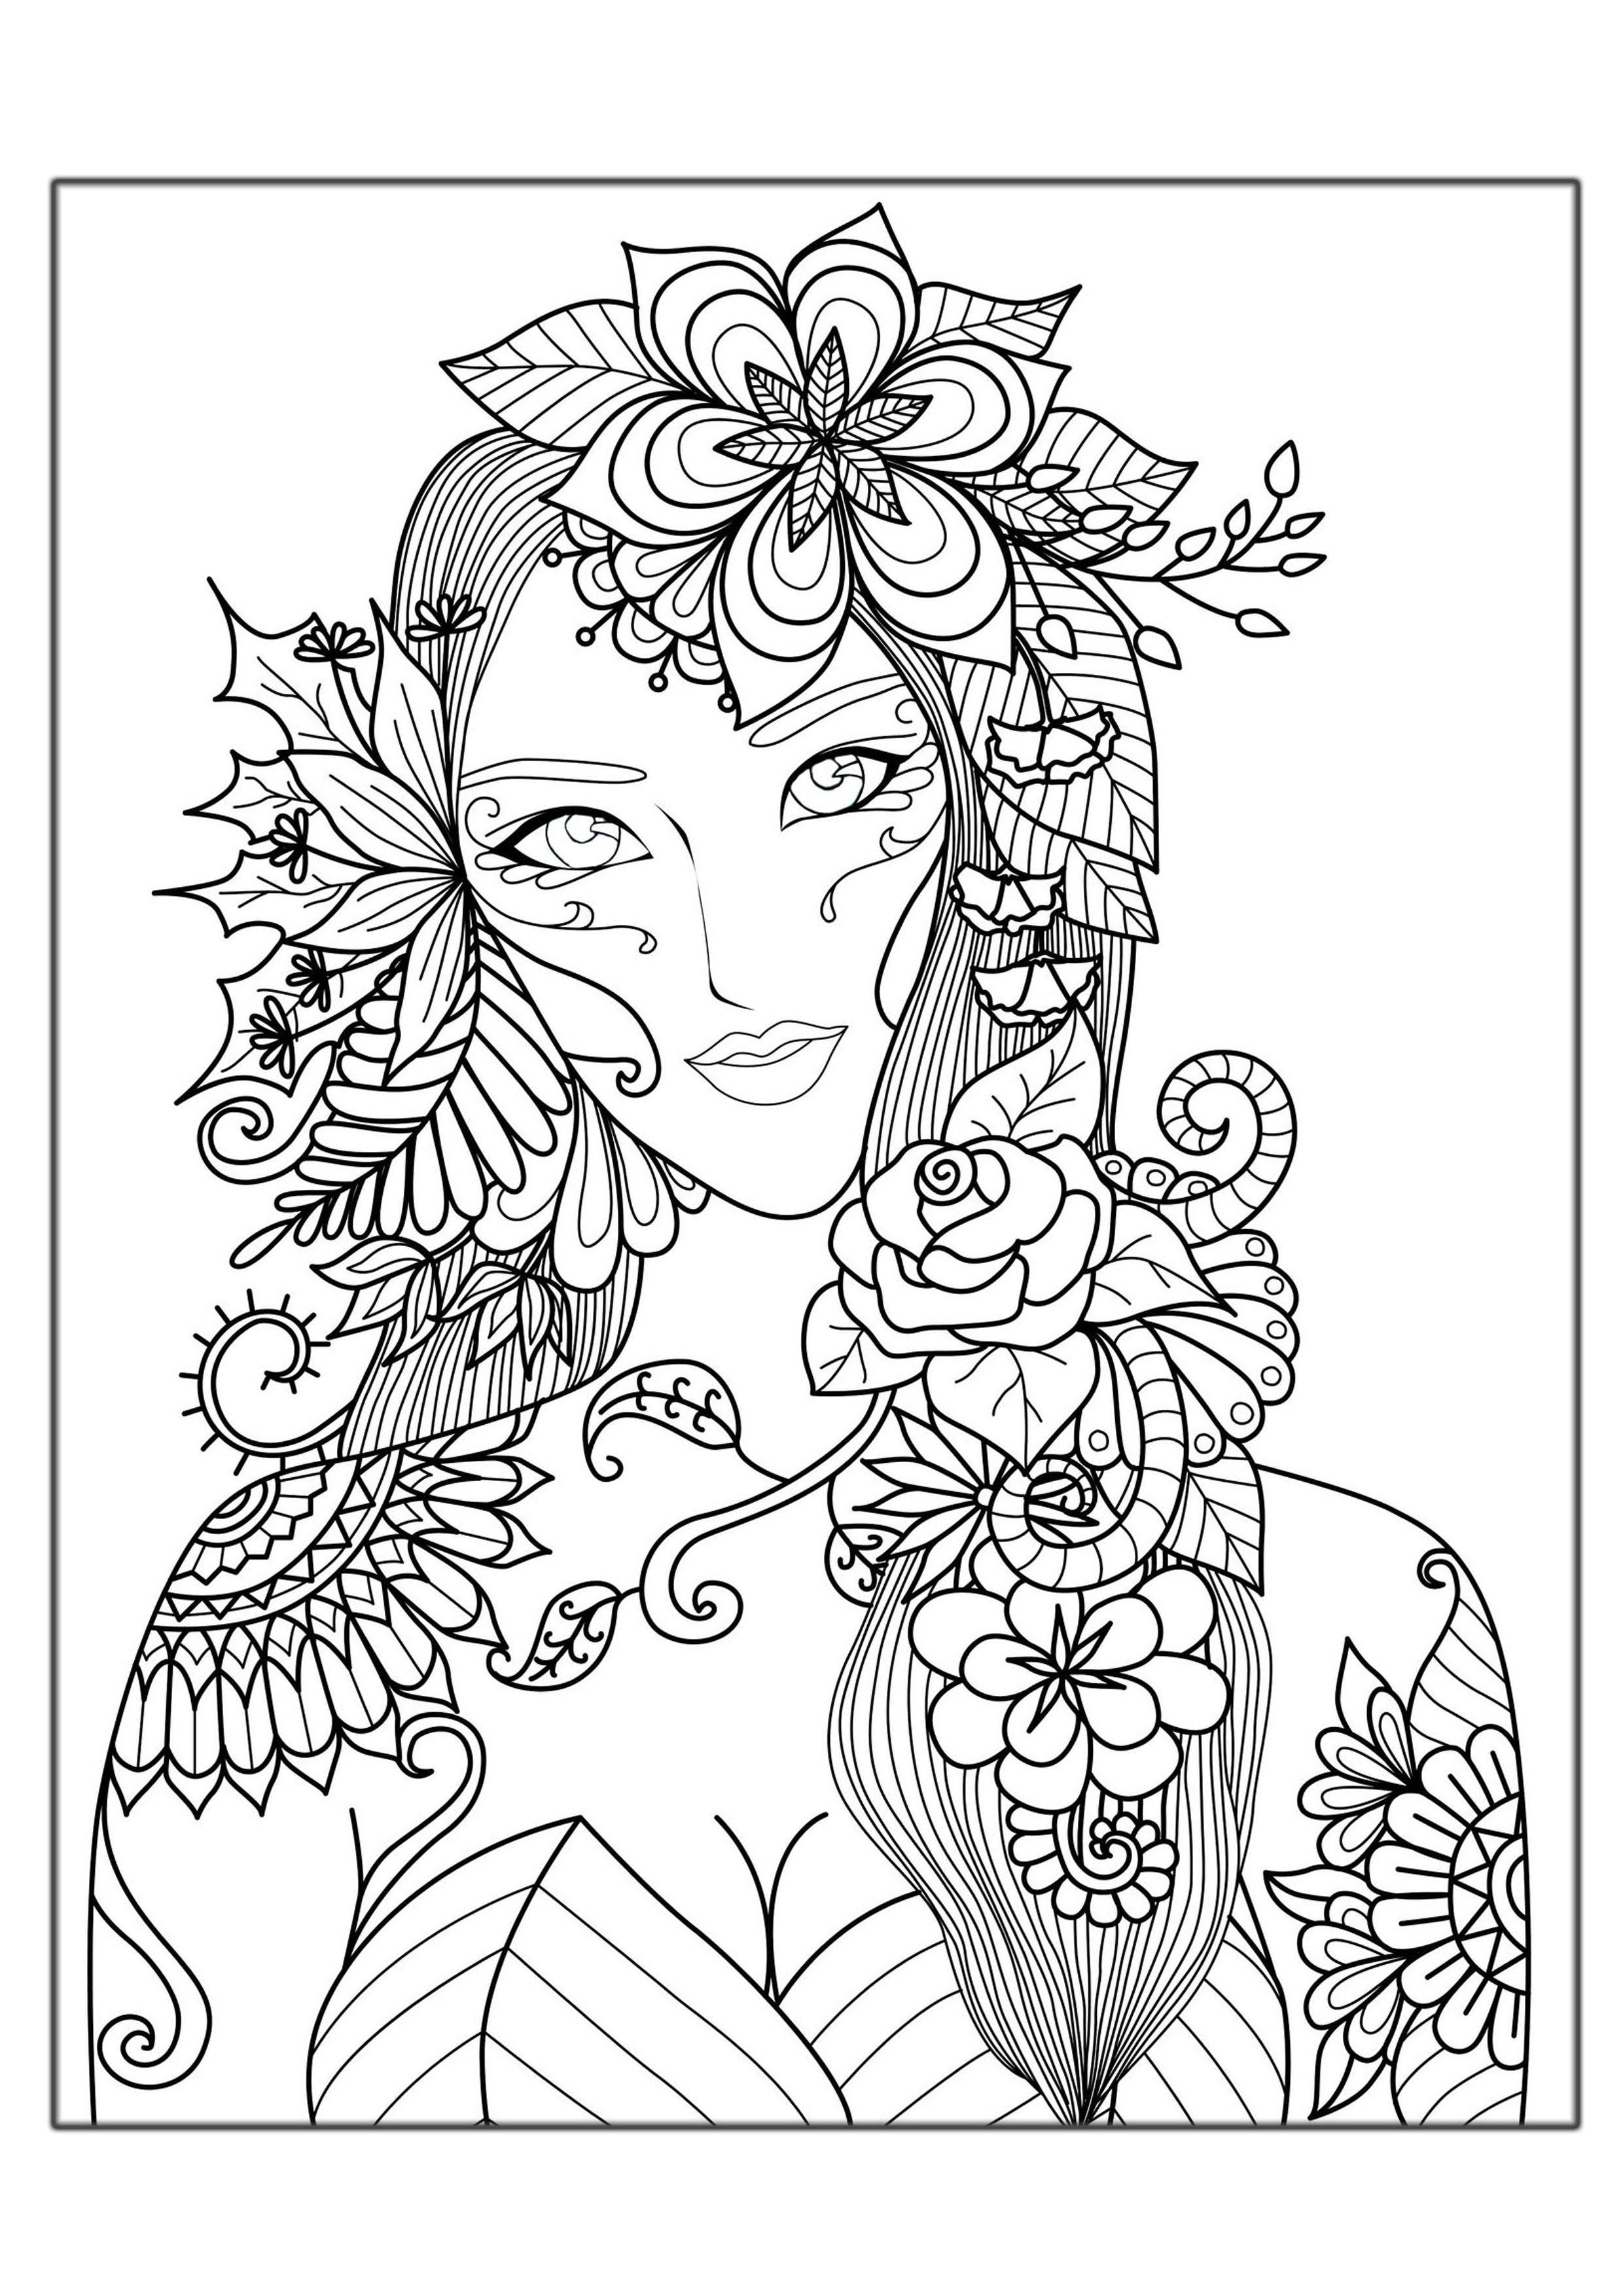 Free Coloring Sheets Adults  Hard Coloring Pages for Adults Best Coloring Pages For Kids